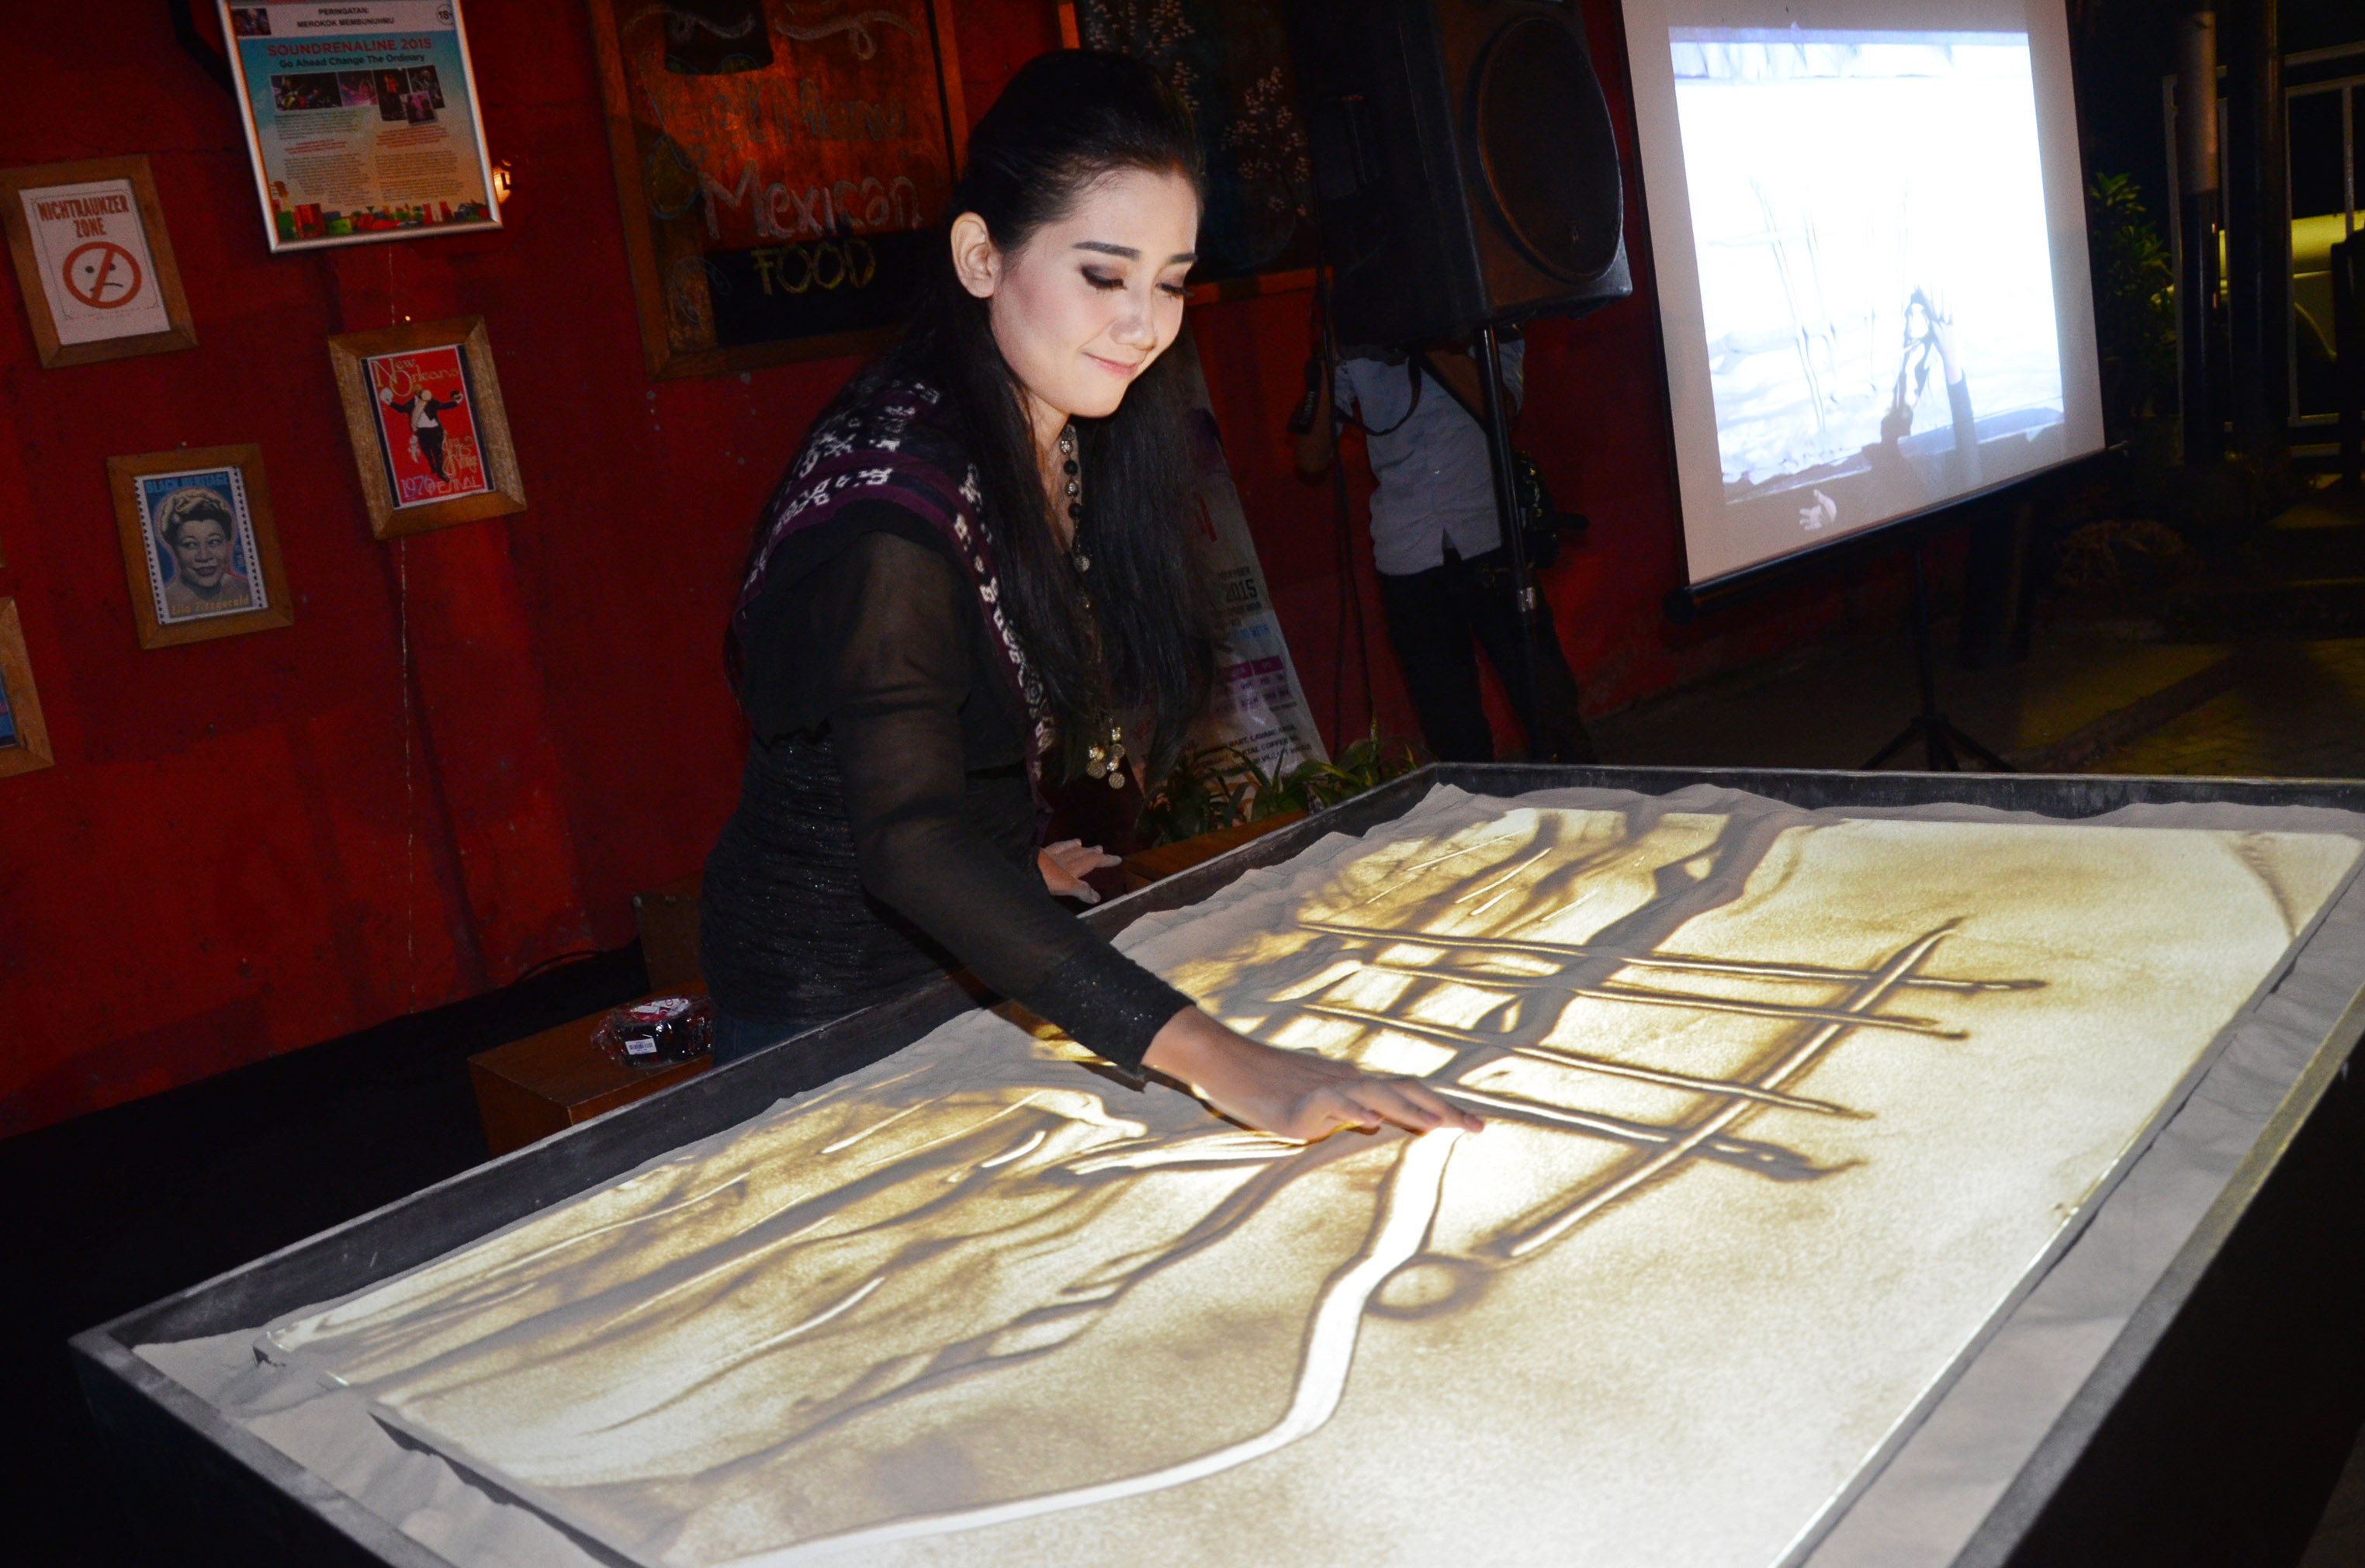 Baiq Amalia Putri Ghaesani (19) menunjukkan keahliannya melukis dengan media pasir saat menggelar pertunjukkan melukis pasir di Bandini Koffie, Mataram, NTB, Senin (26/10). Pertunjukkan melukis dengan media pasir yang berkolaborasi dengan pemusik Ary Juliant tersebut diselenggarakan sebagai penggalangan dana Baiq Amalia Putri Ghaesani untuk mengikuti pemilihan putri Pariwisata Indonesia 2015 mewakili NTB. ANTARA FOTO/Ahmad Subaidi.